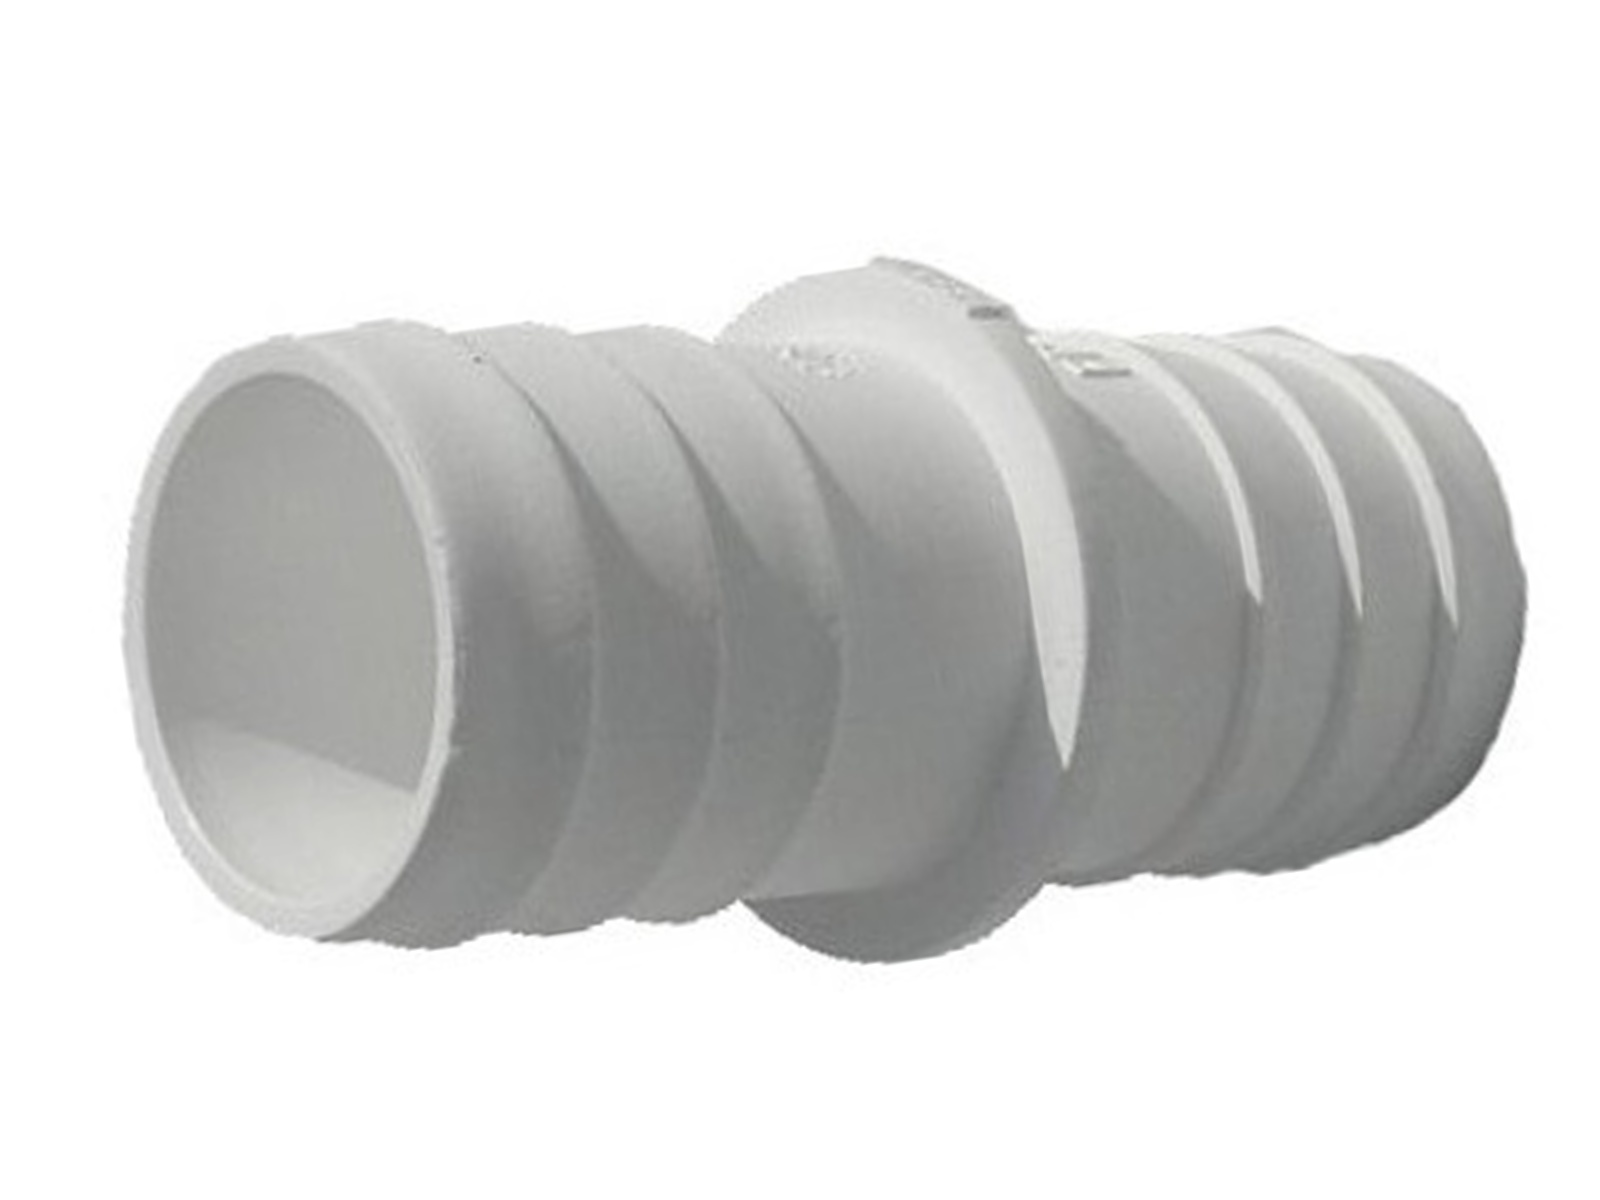 Bazénová spojka hadice MARIMEX 38 mm